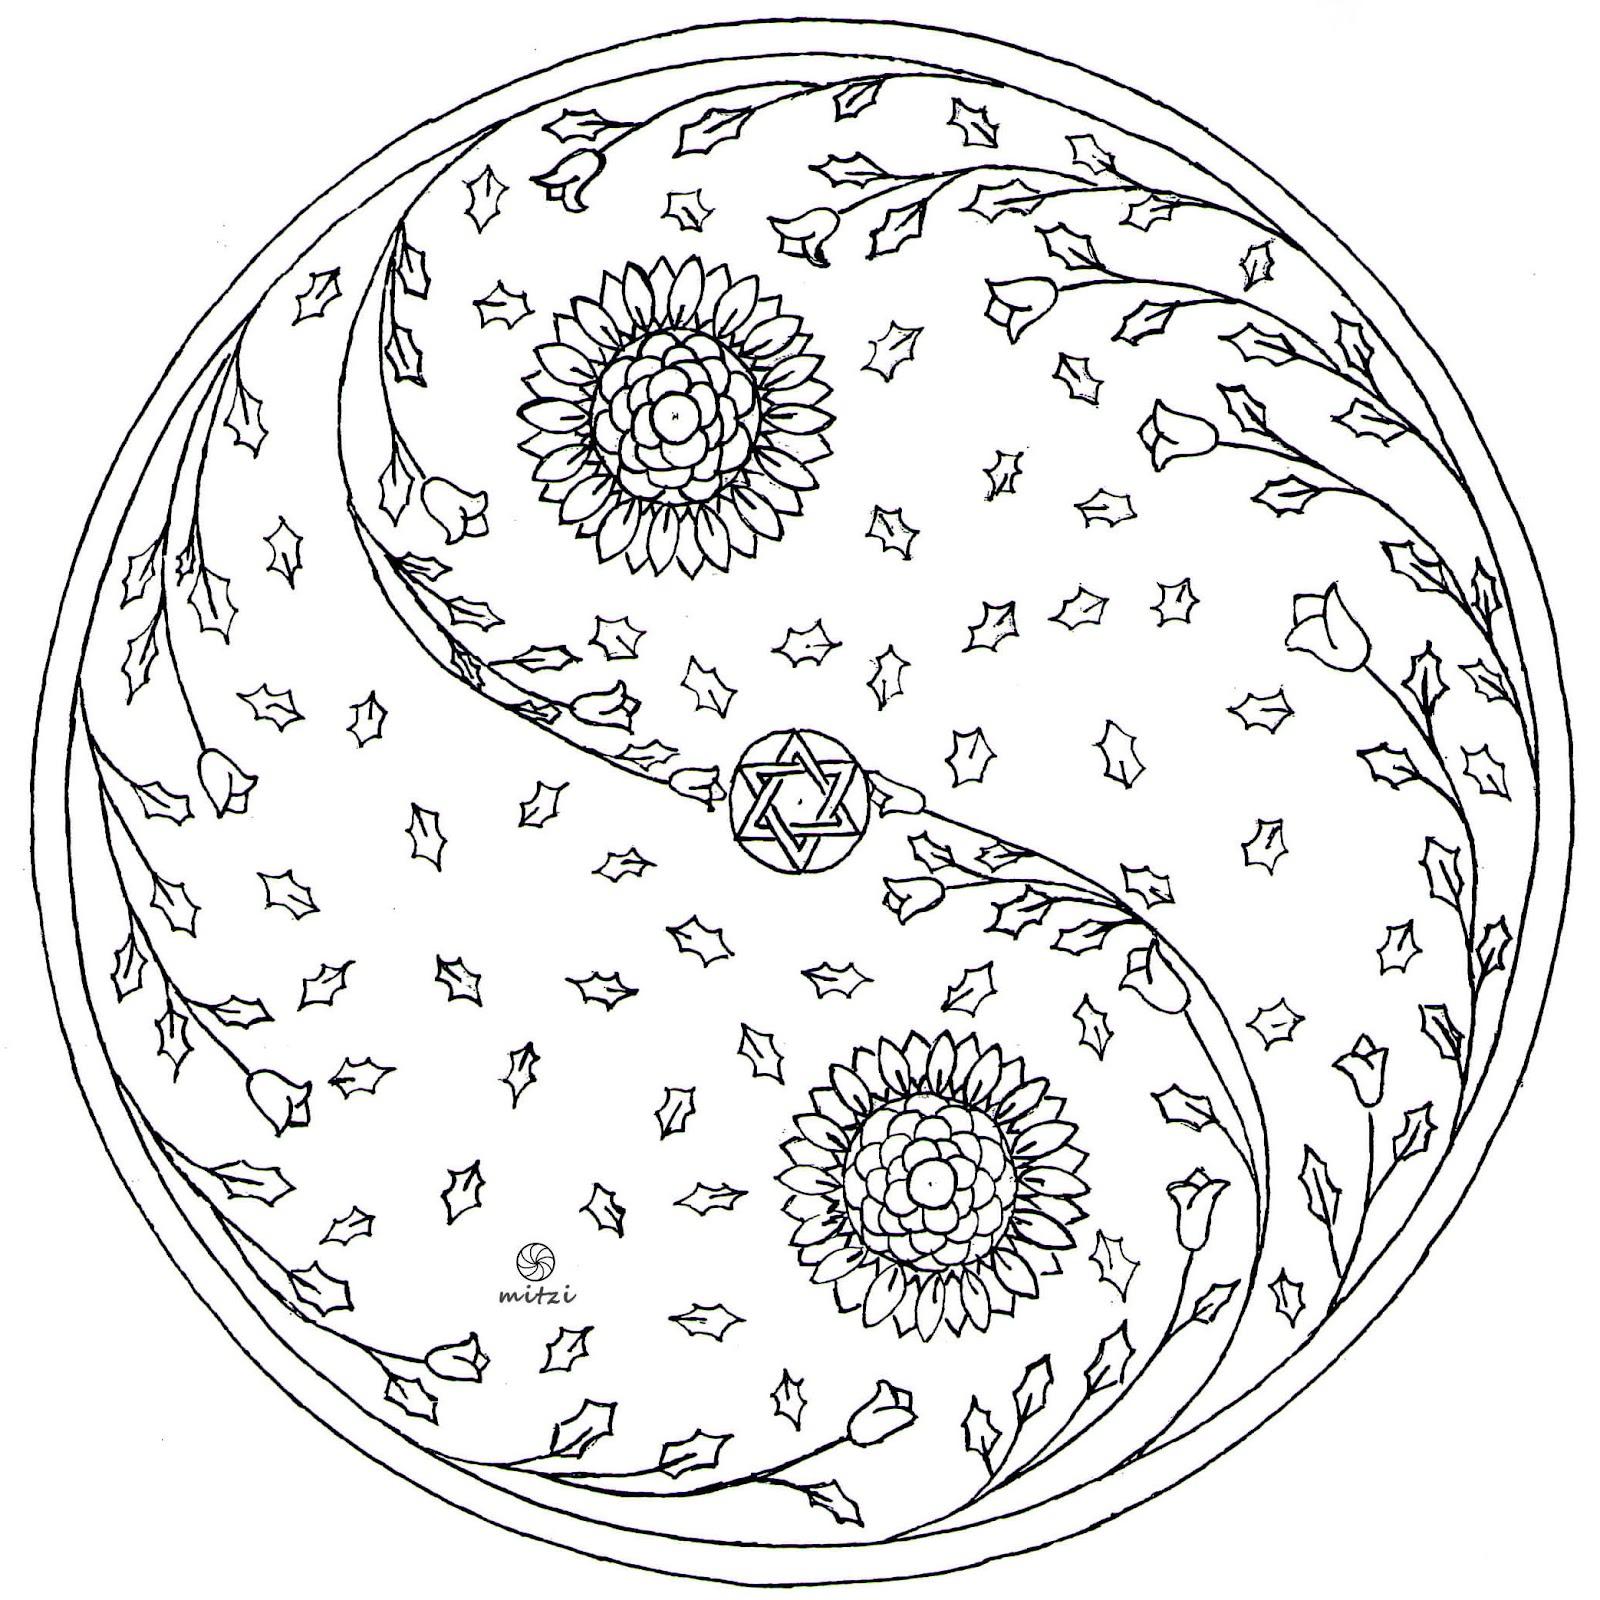 ying yang yo coloring pages - photo#20